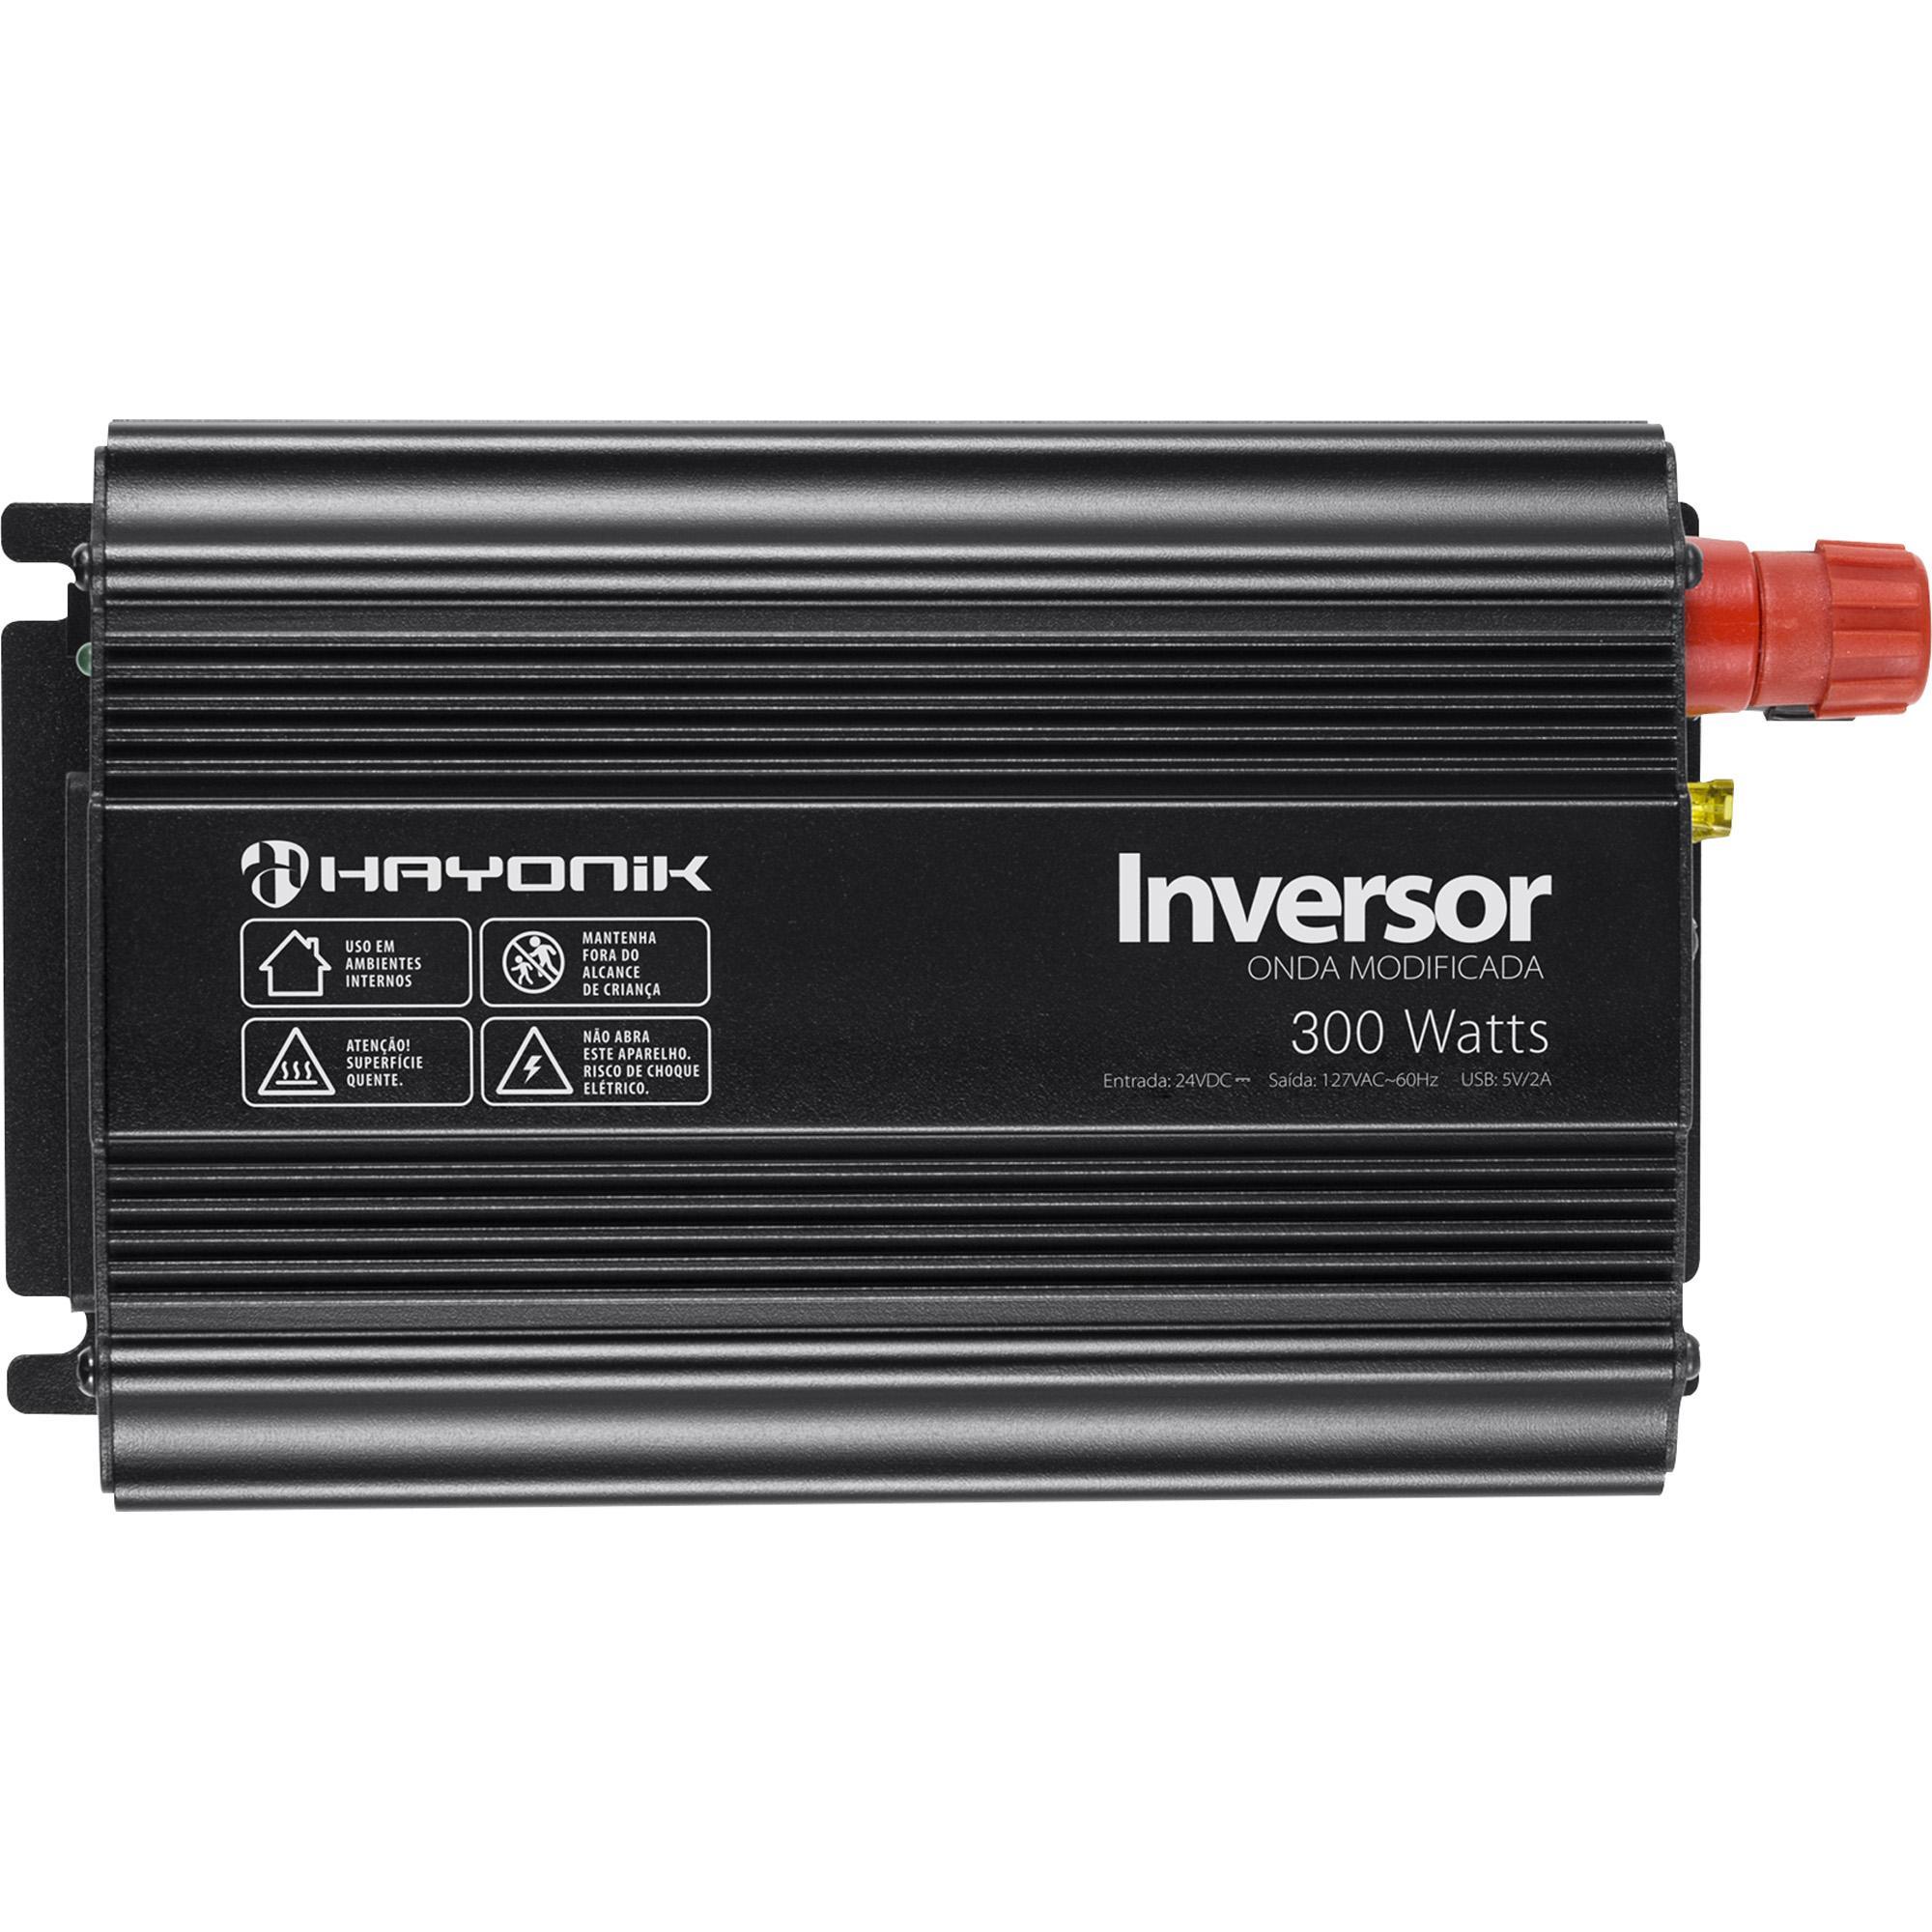 Inversor de Onda Modificada 300W 24VDC/127V PW11-8 HAYONIK